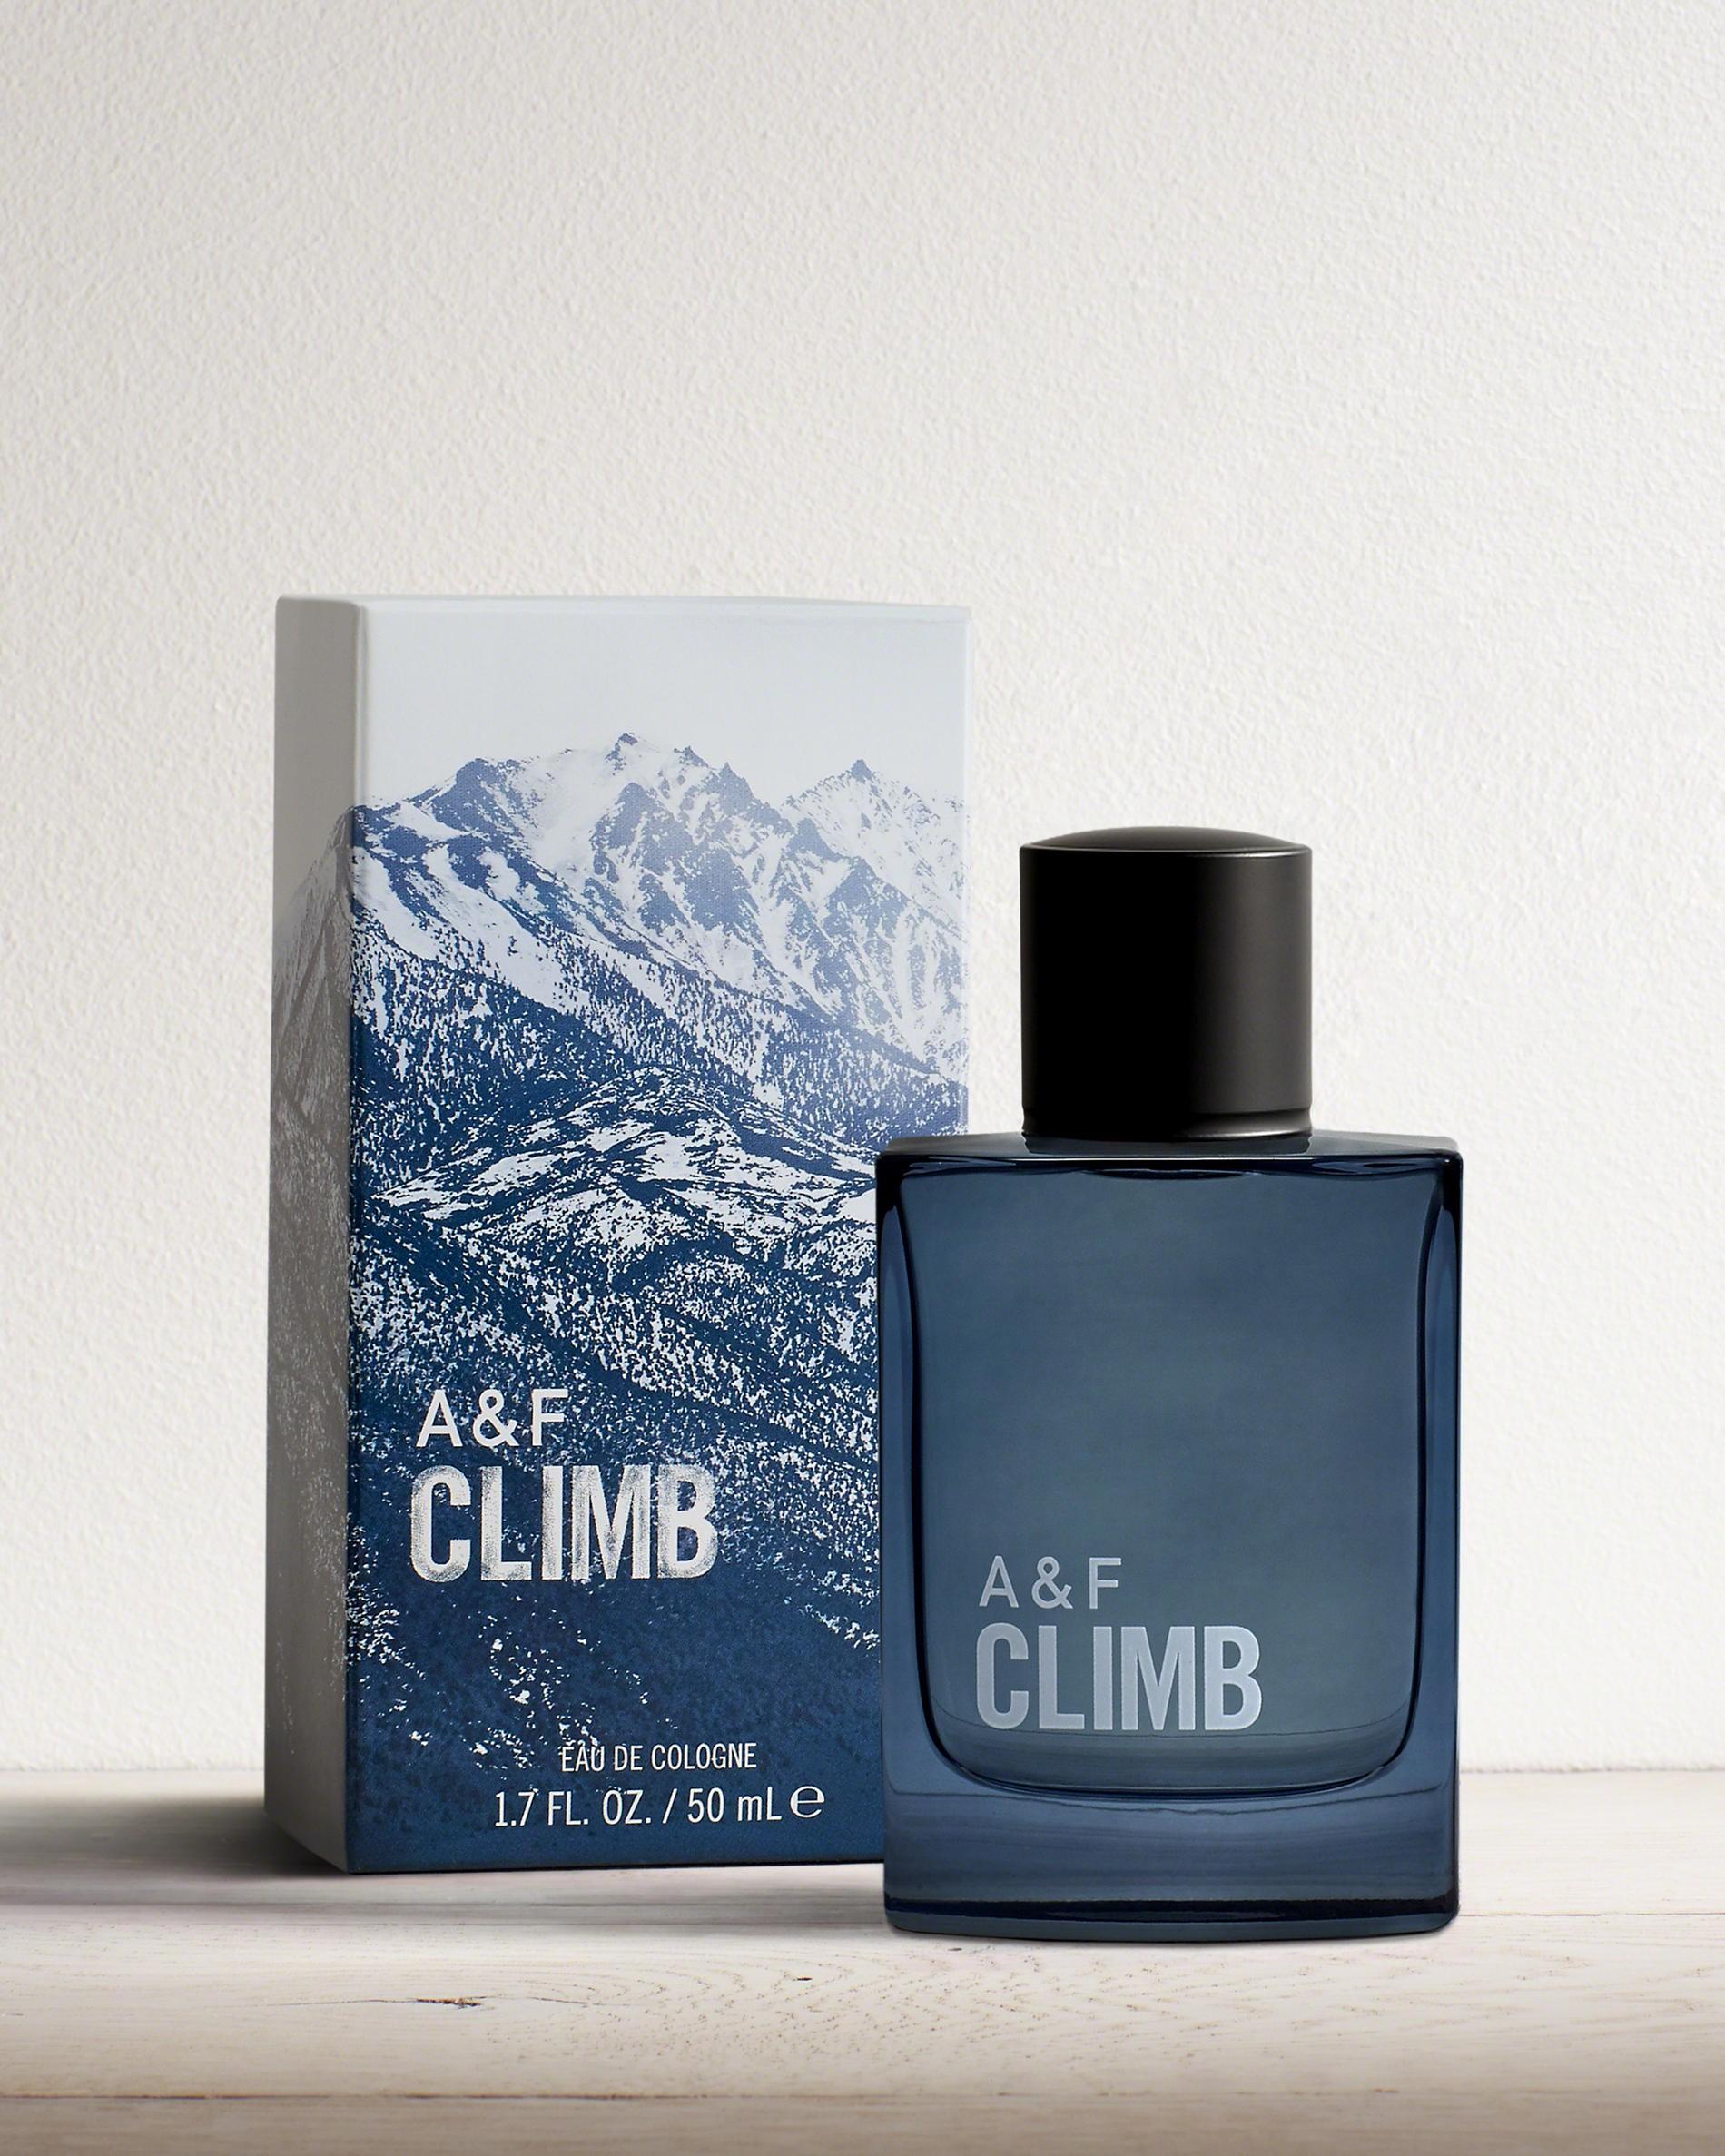 Abercrombie & Fitch A&f Climb аромат для мужчин